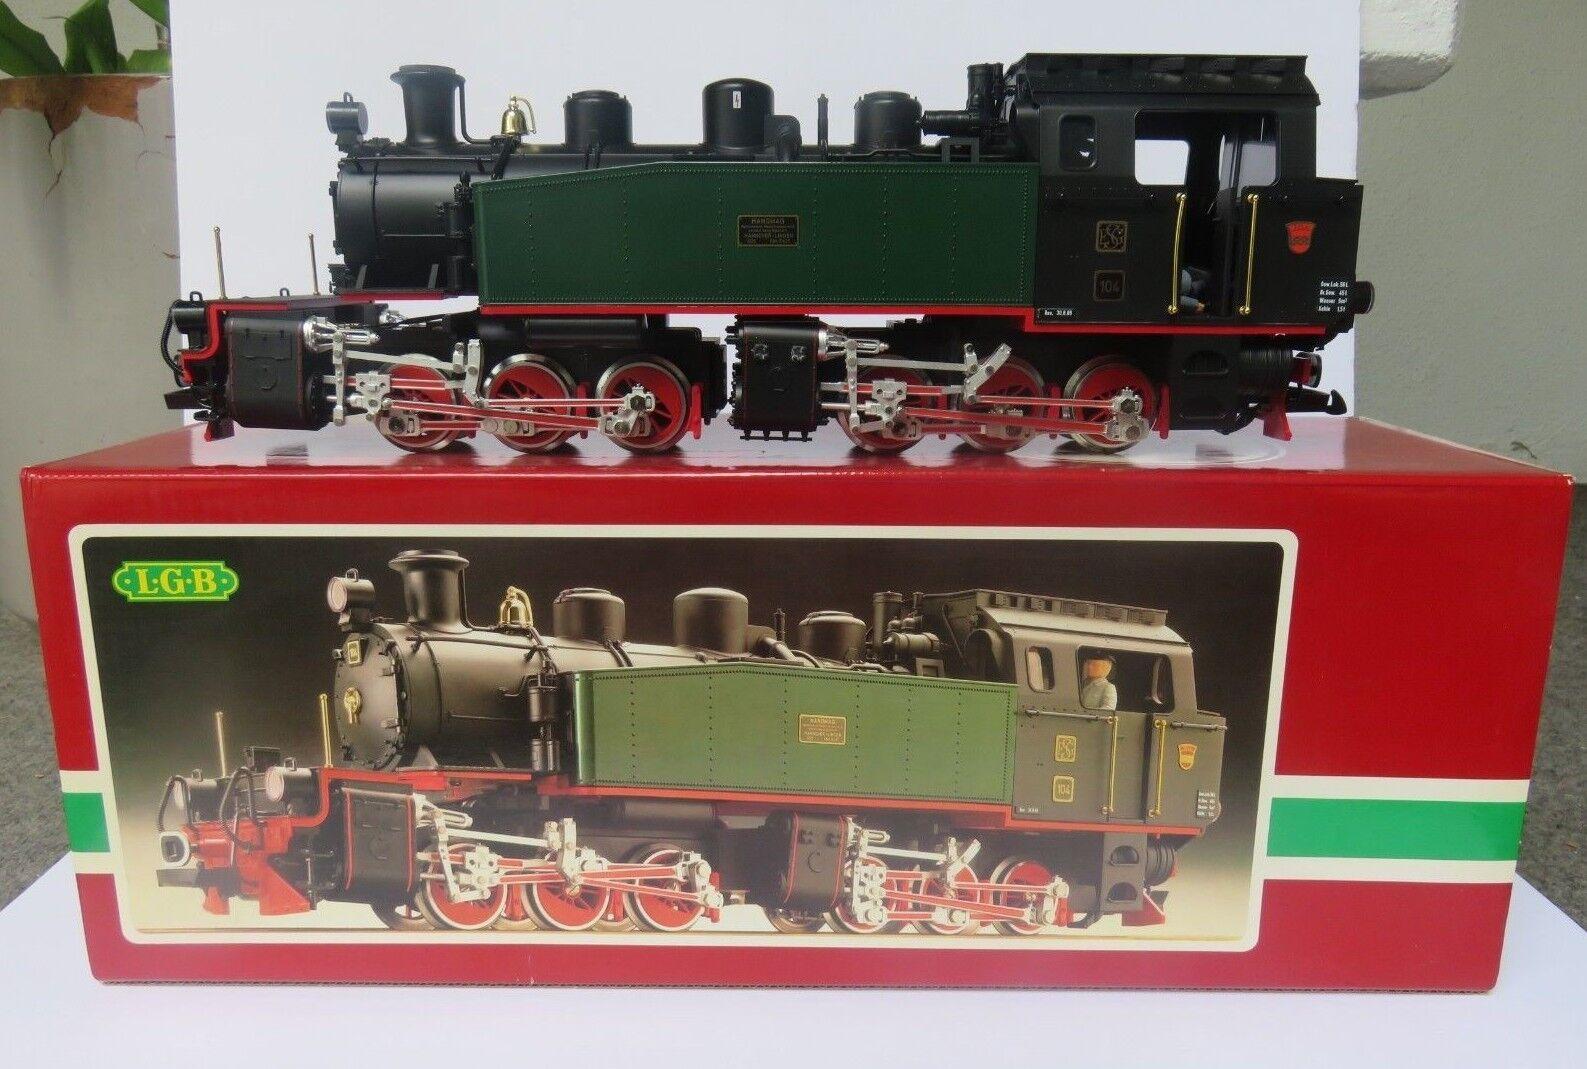 LGB 2085D II Mazo Motor Escala G Locomotora de vapor 0-6-0 W Germany